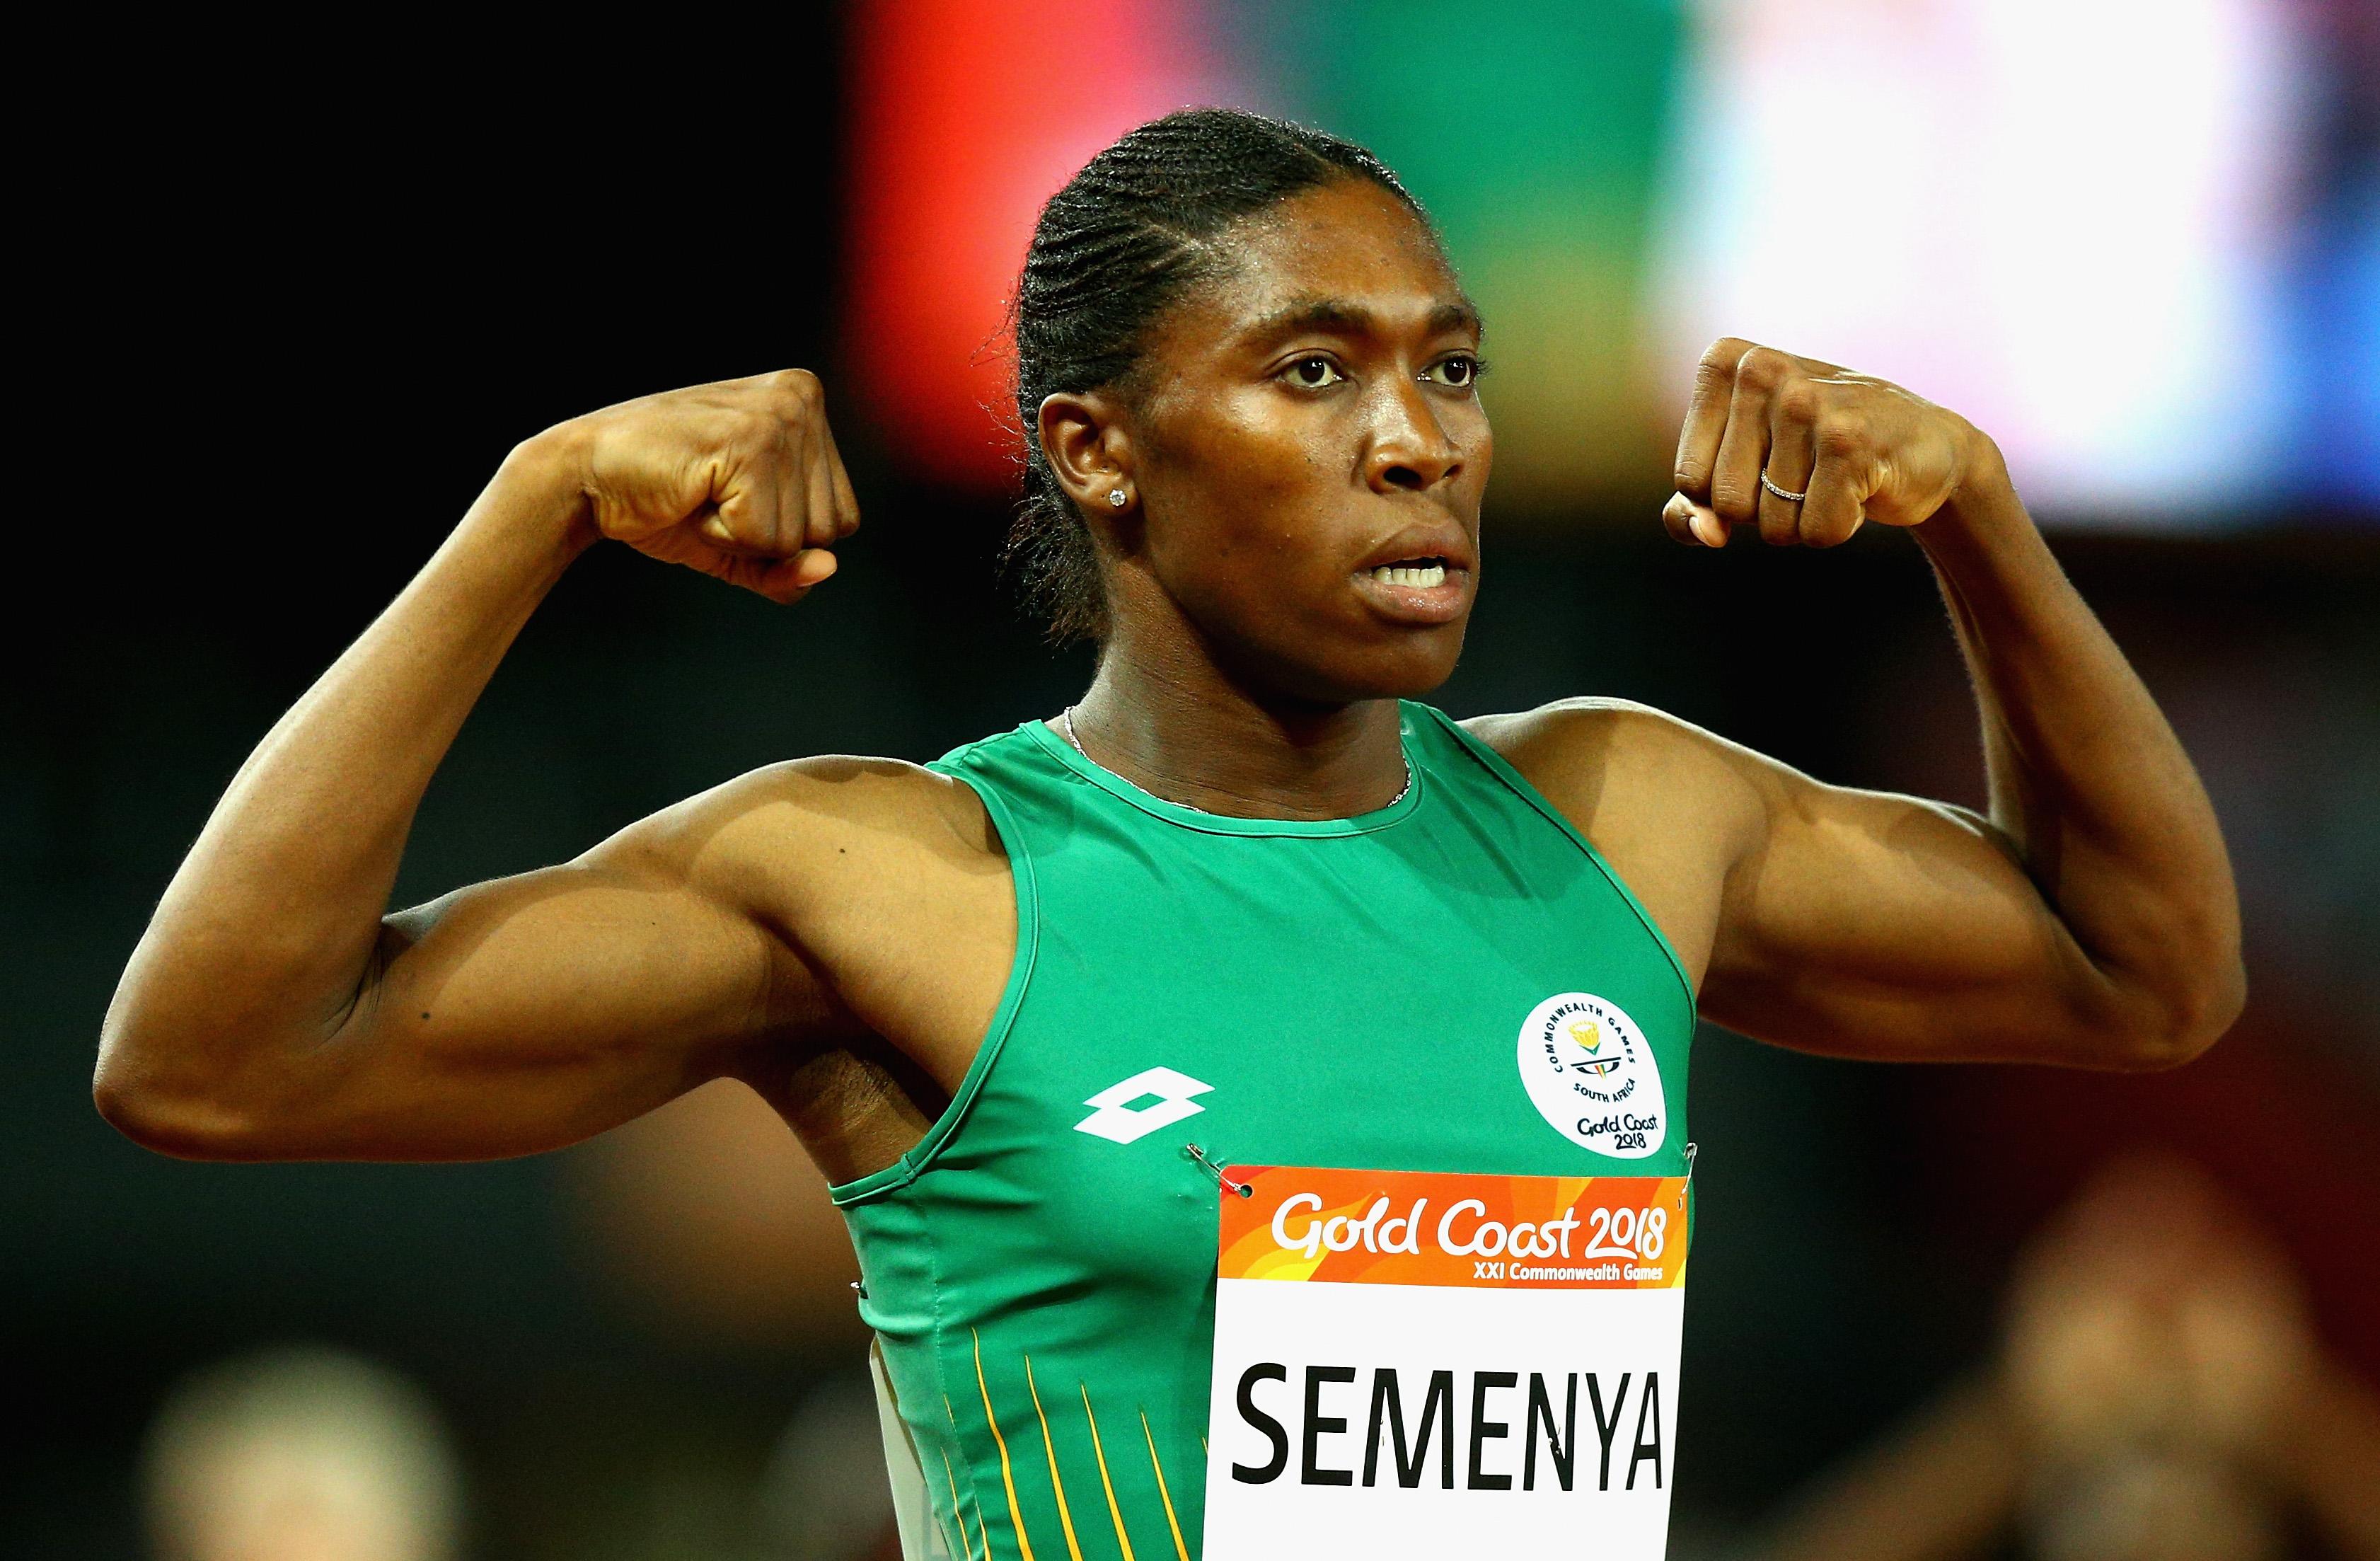 Athletics - Commonwealth Games Day 9